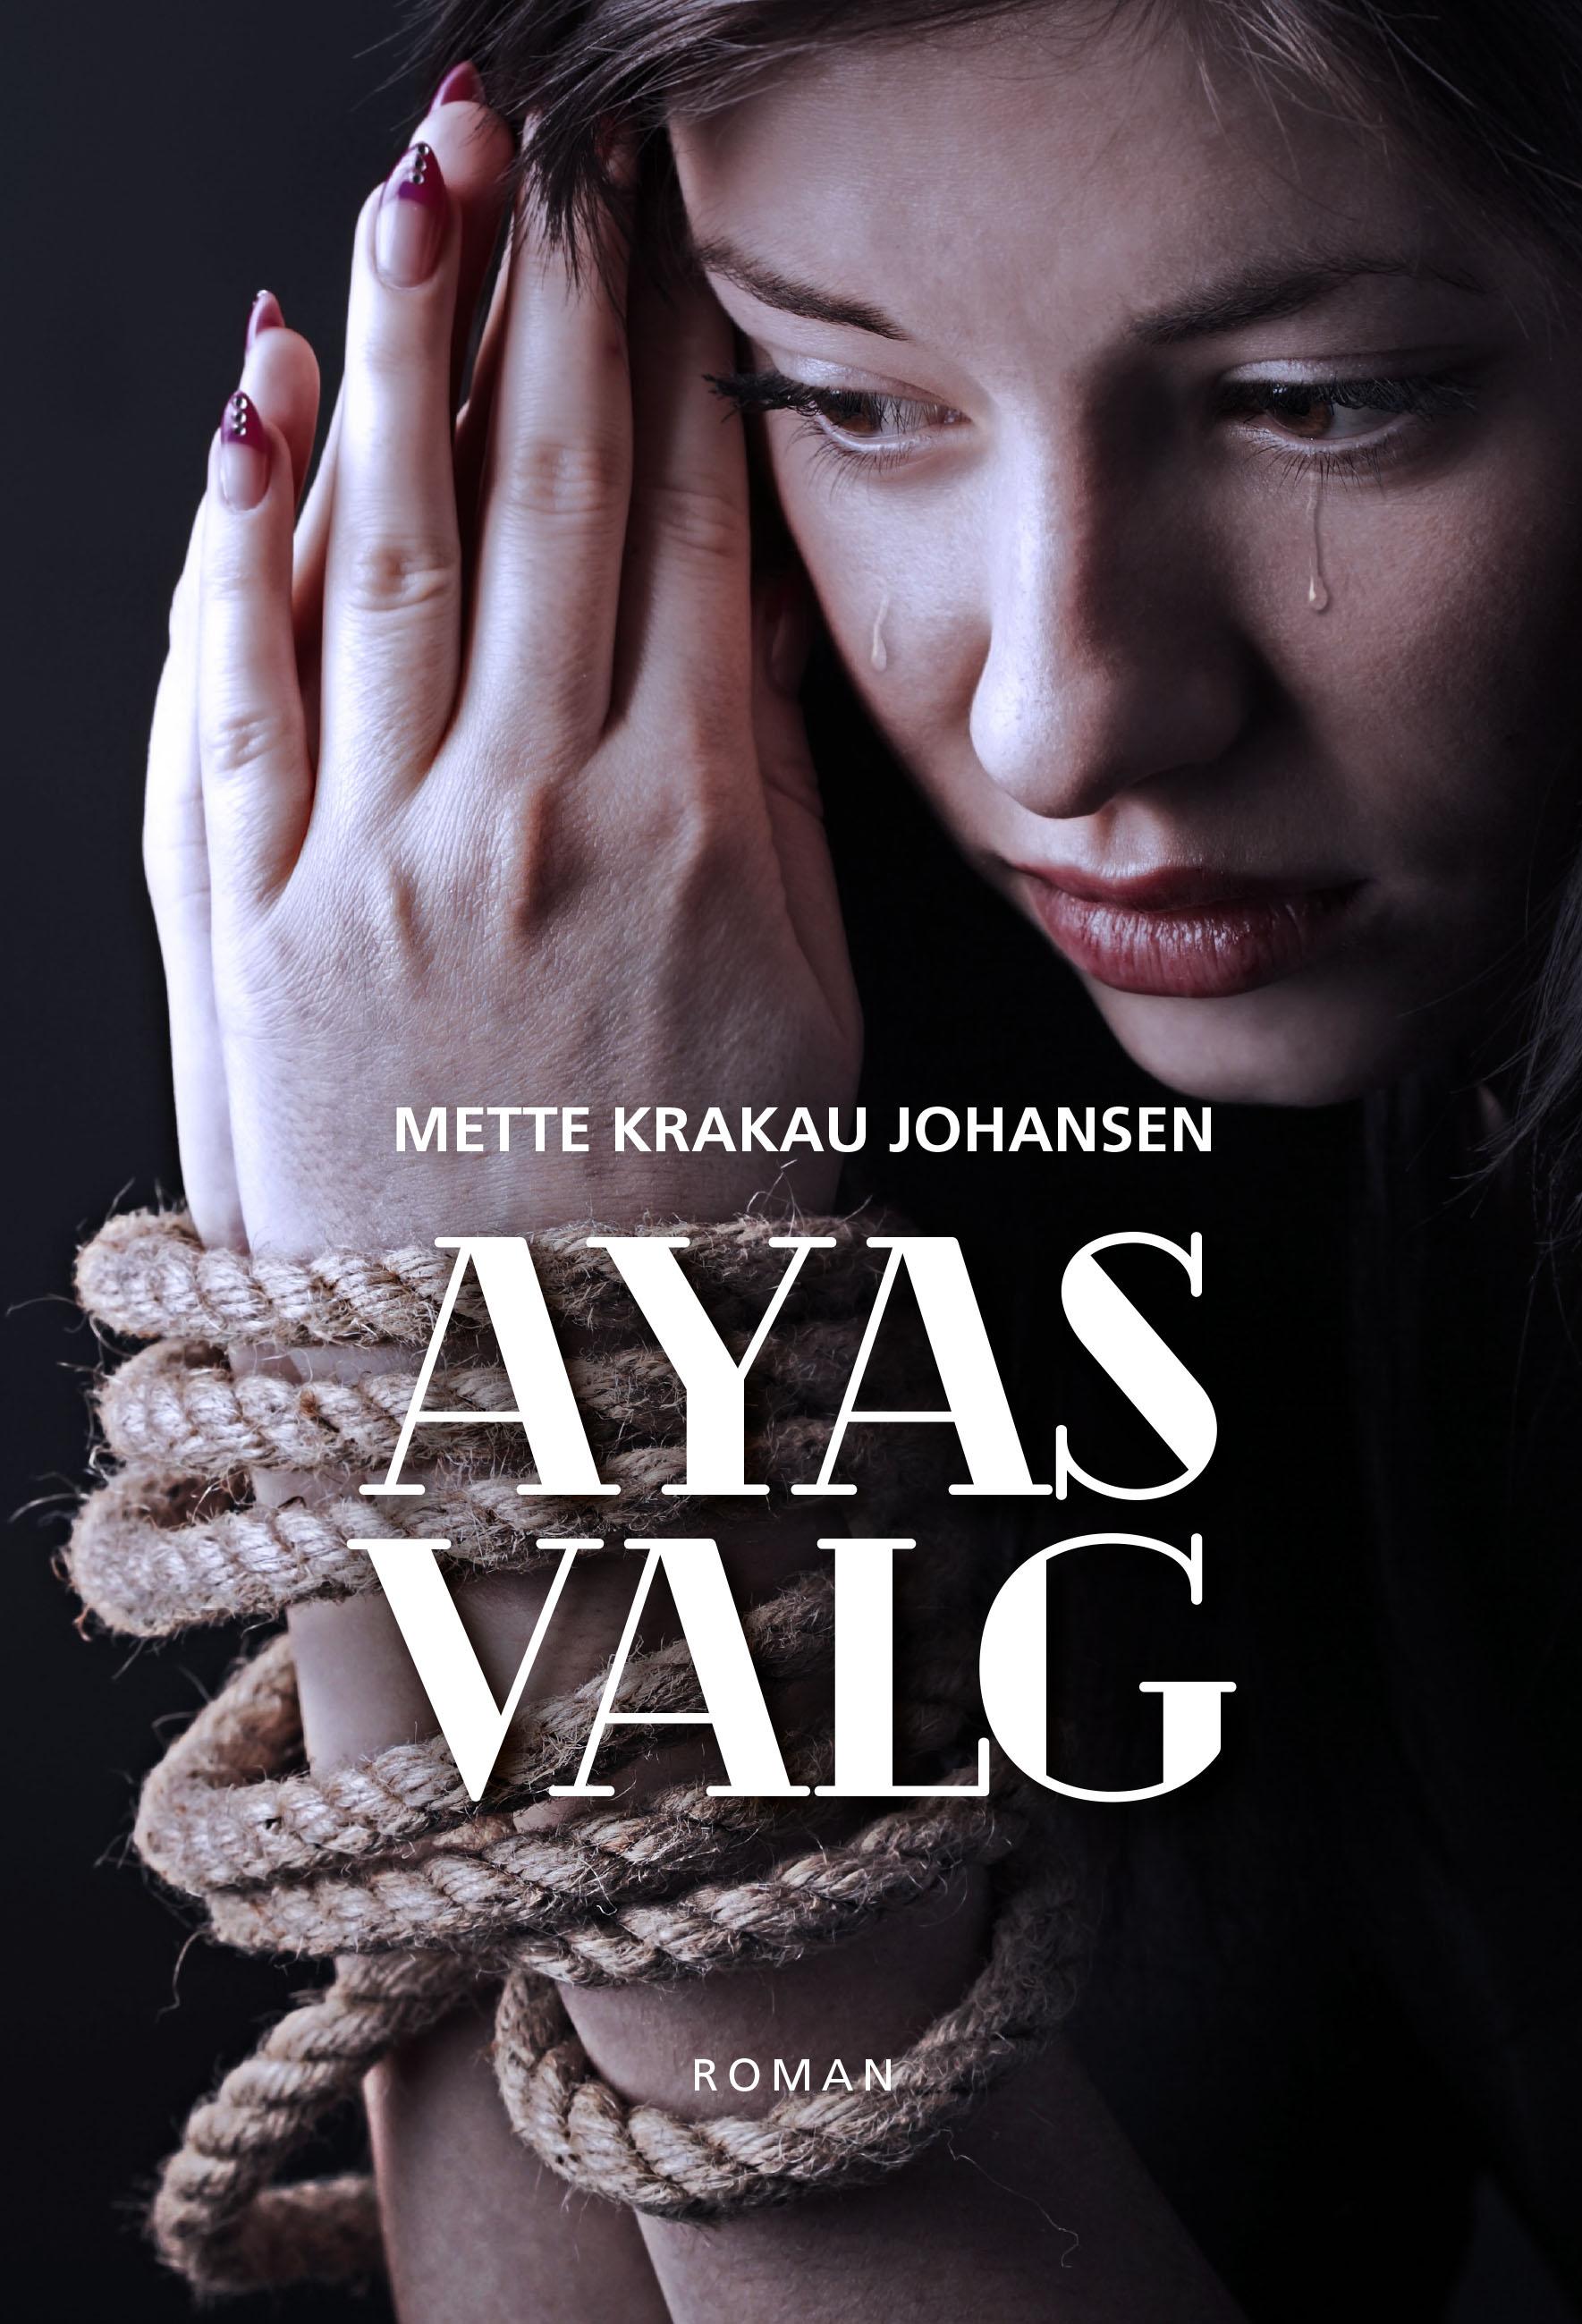 Ayas valg af Mette Krakau Johansen - 9788794049405